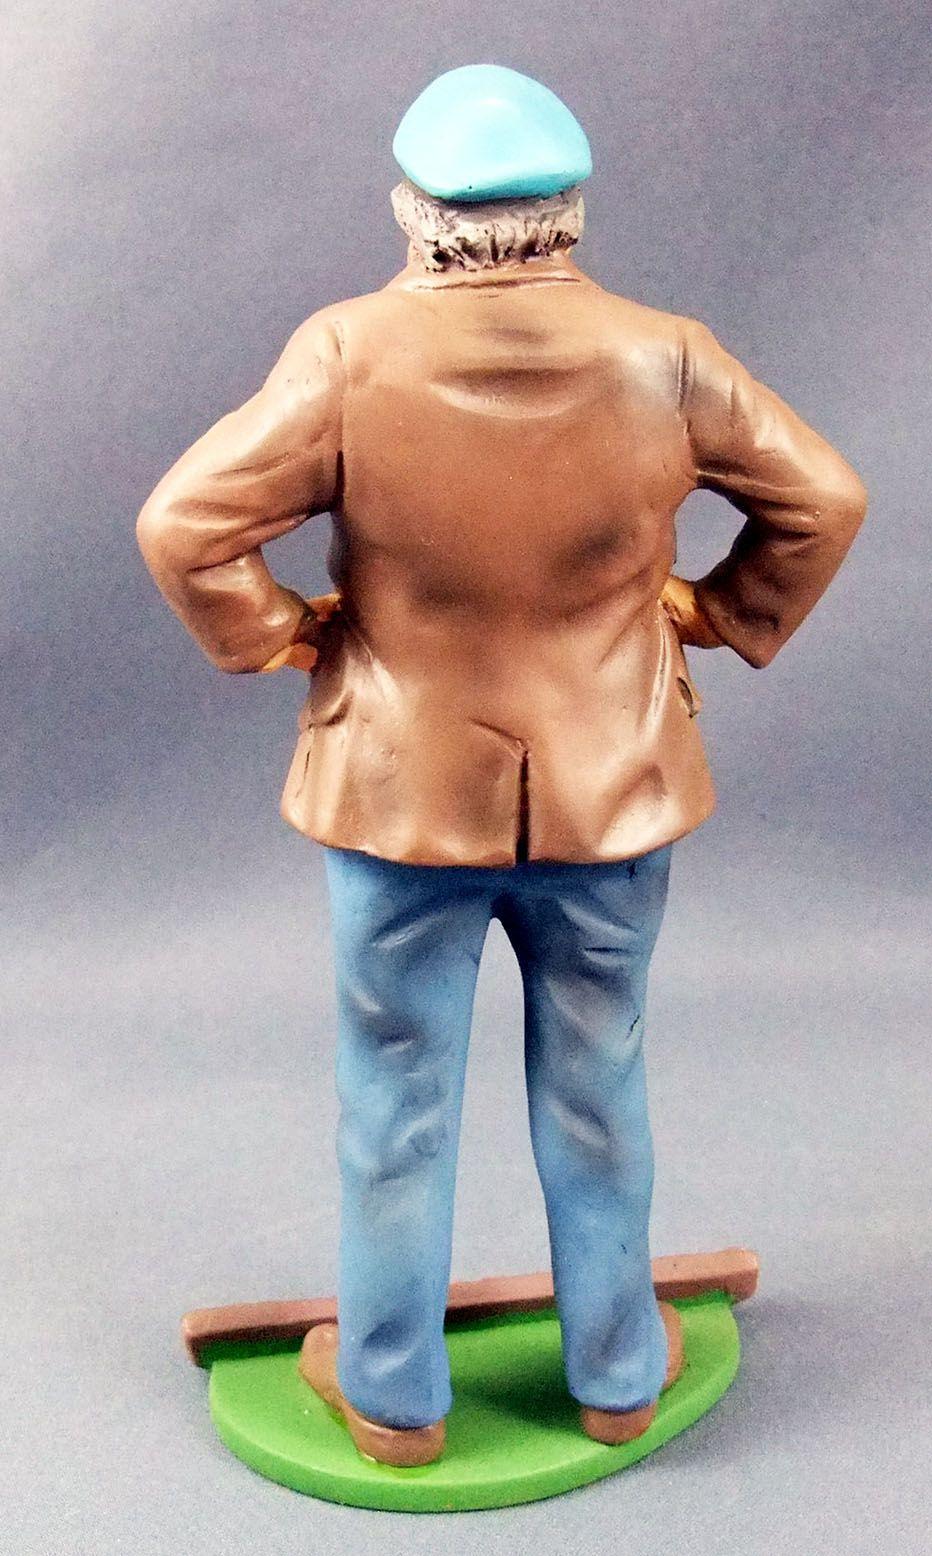 Tex Willer - Statuette résine Hachette - Capitaine Barbanera